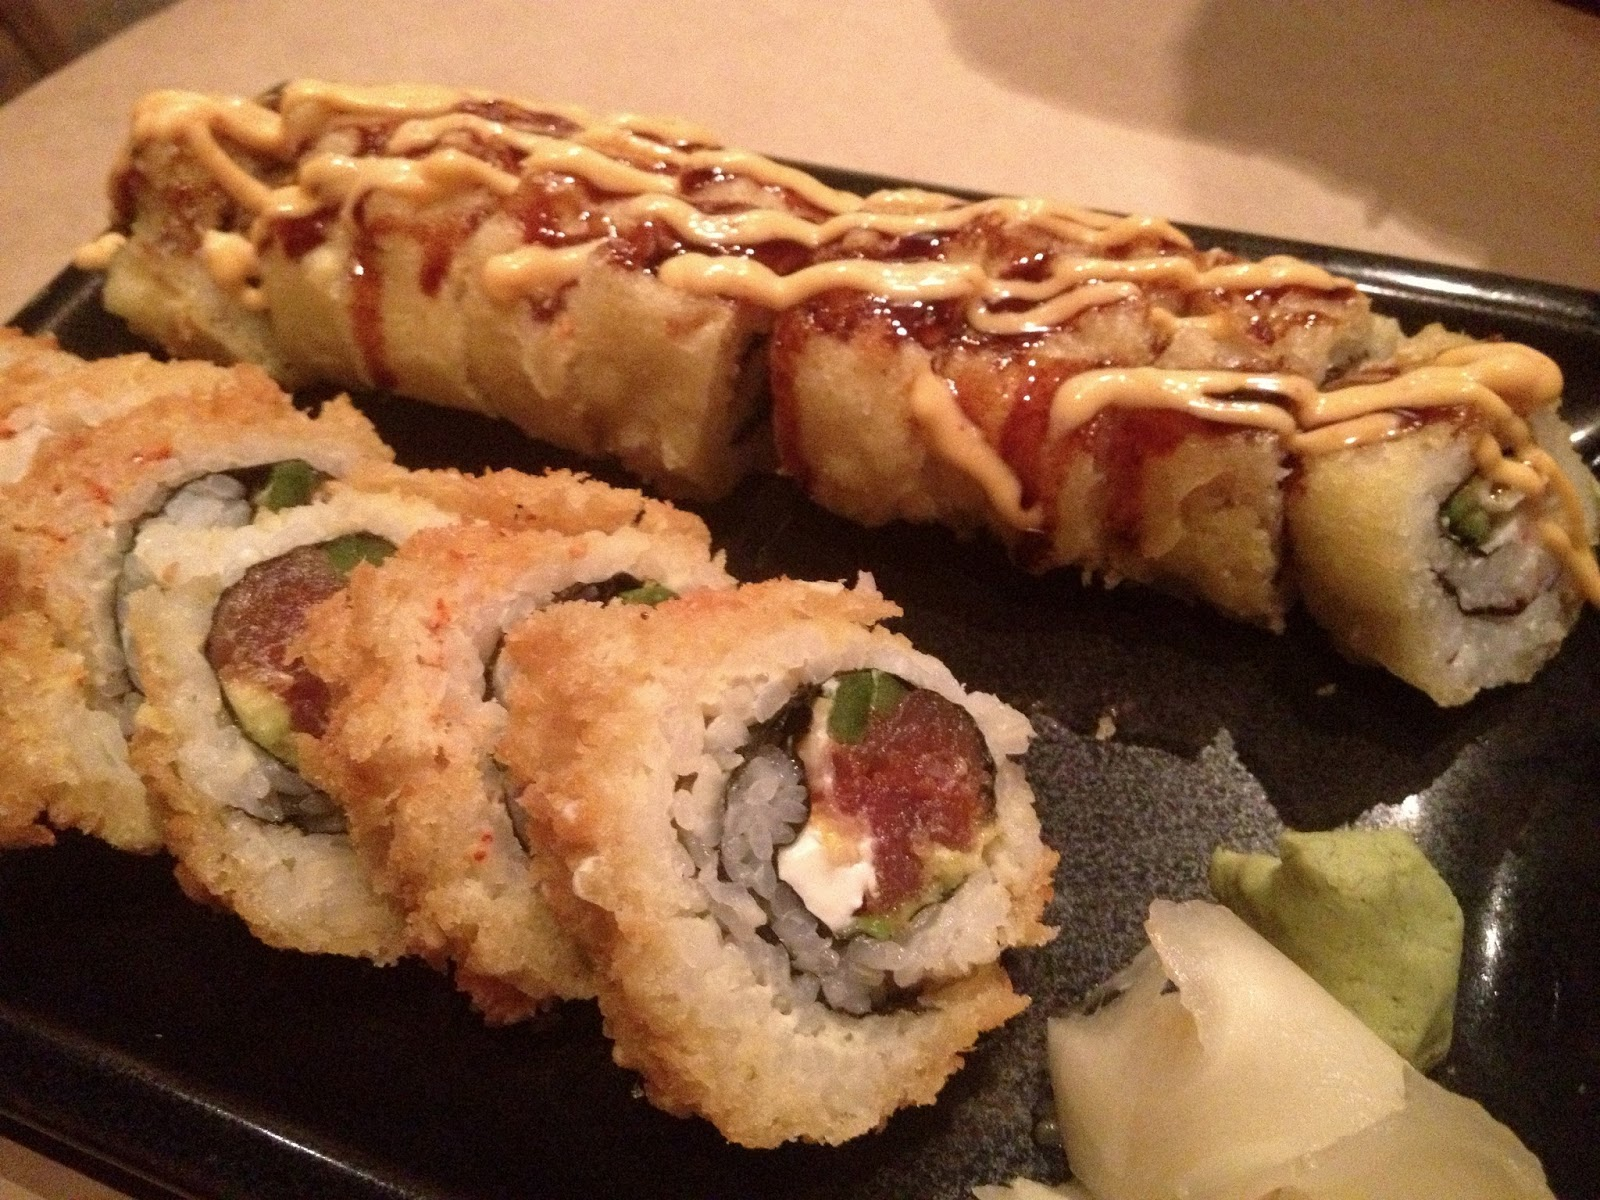 food blog, utah food blog, food blogger, happy sumo, sushi, sushi places in utah, panko popper roll, vegas roll, tuna, ahi seared tuna